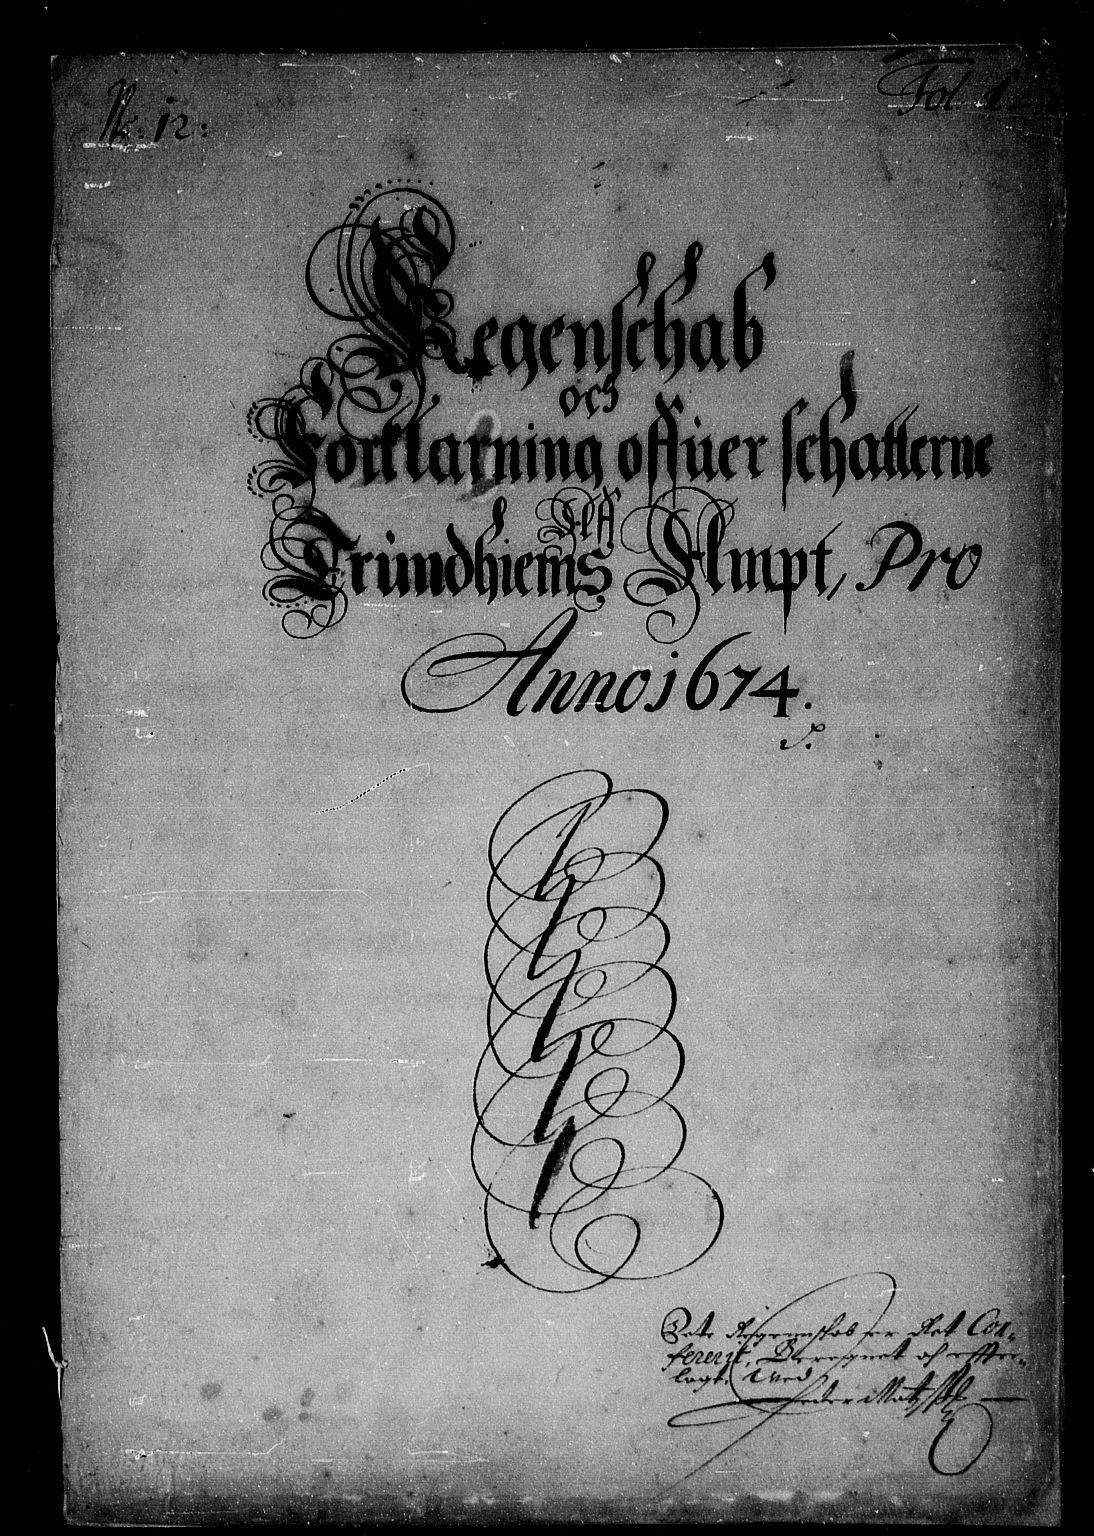 RA, Rentekammeret inntil 1814, Reviderte regnskaper, Stiftamtstueregnskaper, Trondheim stiftamt og Nordland amt, R/Rd/L0039: Trondheim stiftamt, 1674